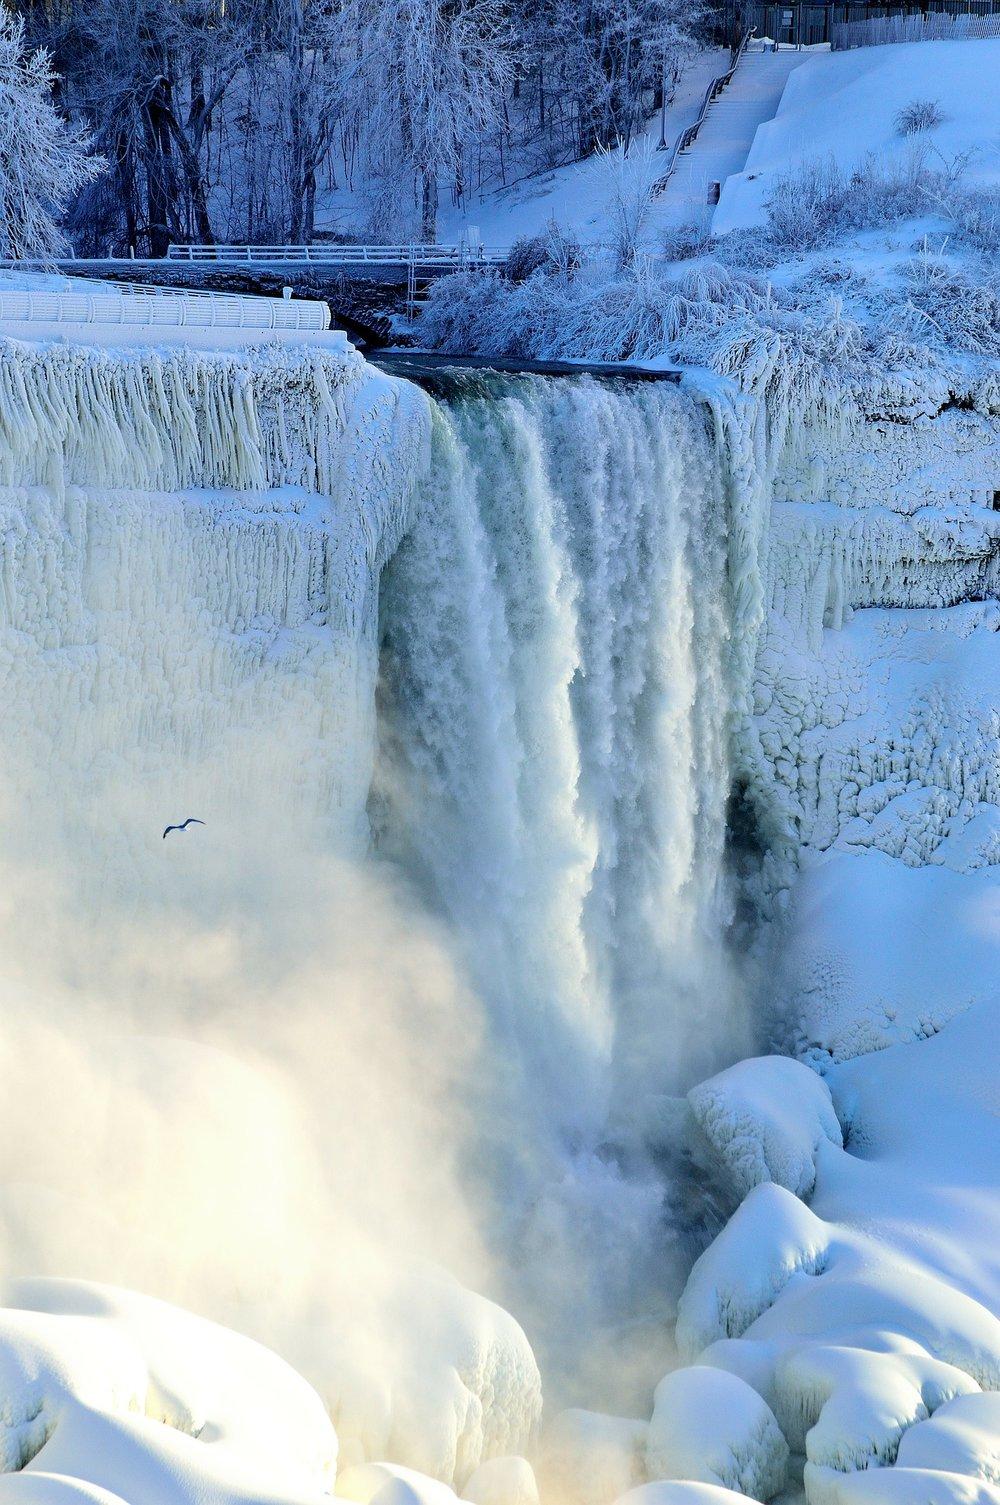 bridal-veil-falls-239139_1920.jpg